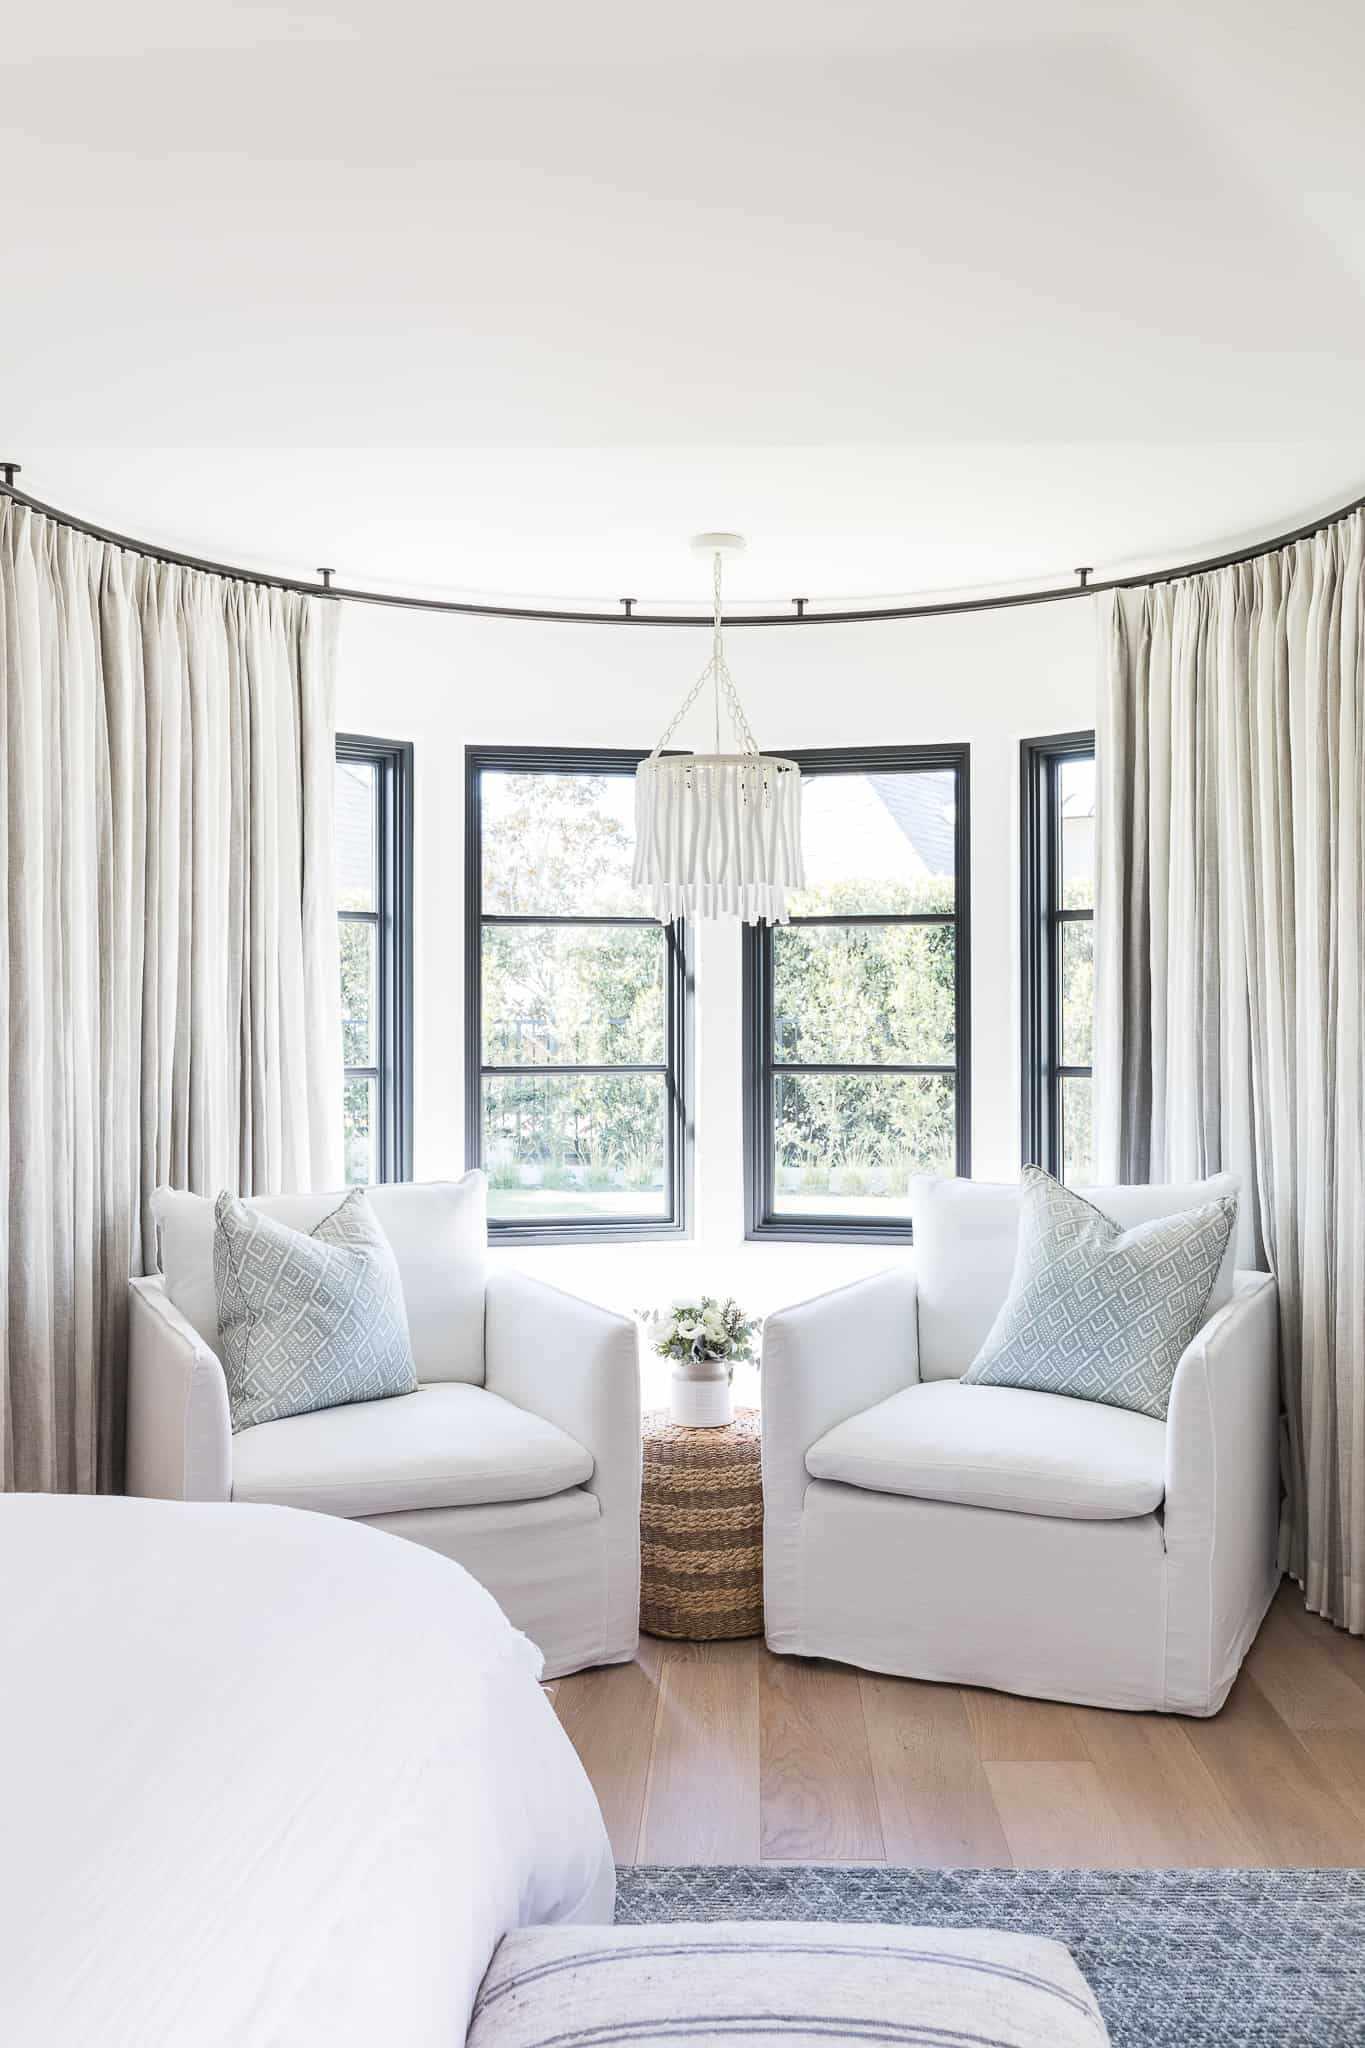 A bay window with custom drapes